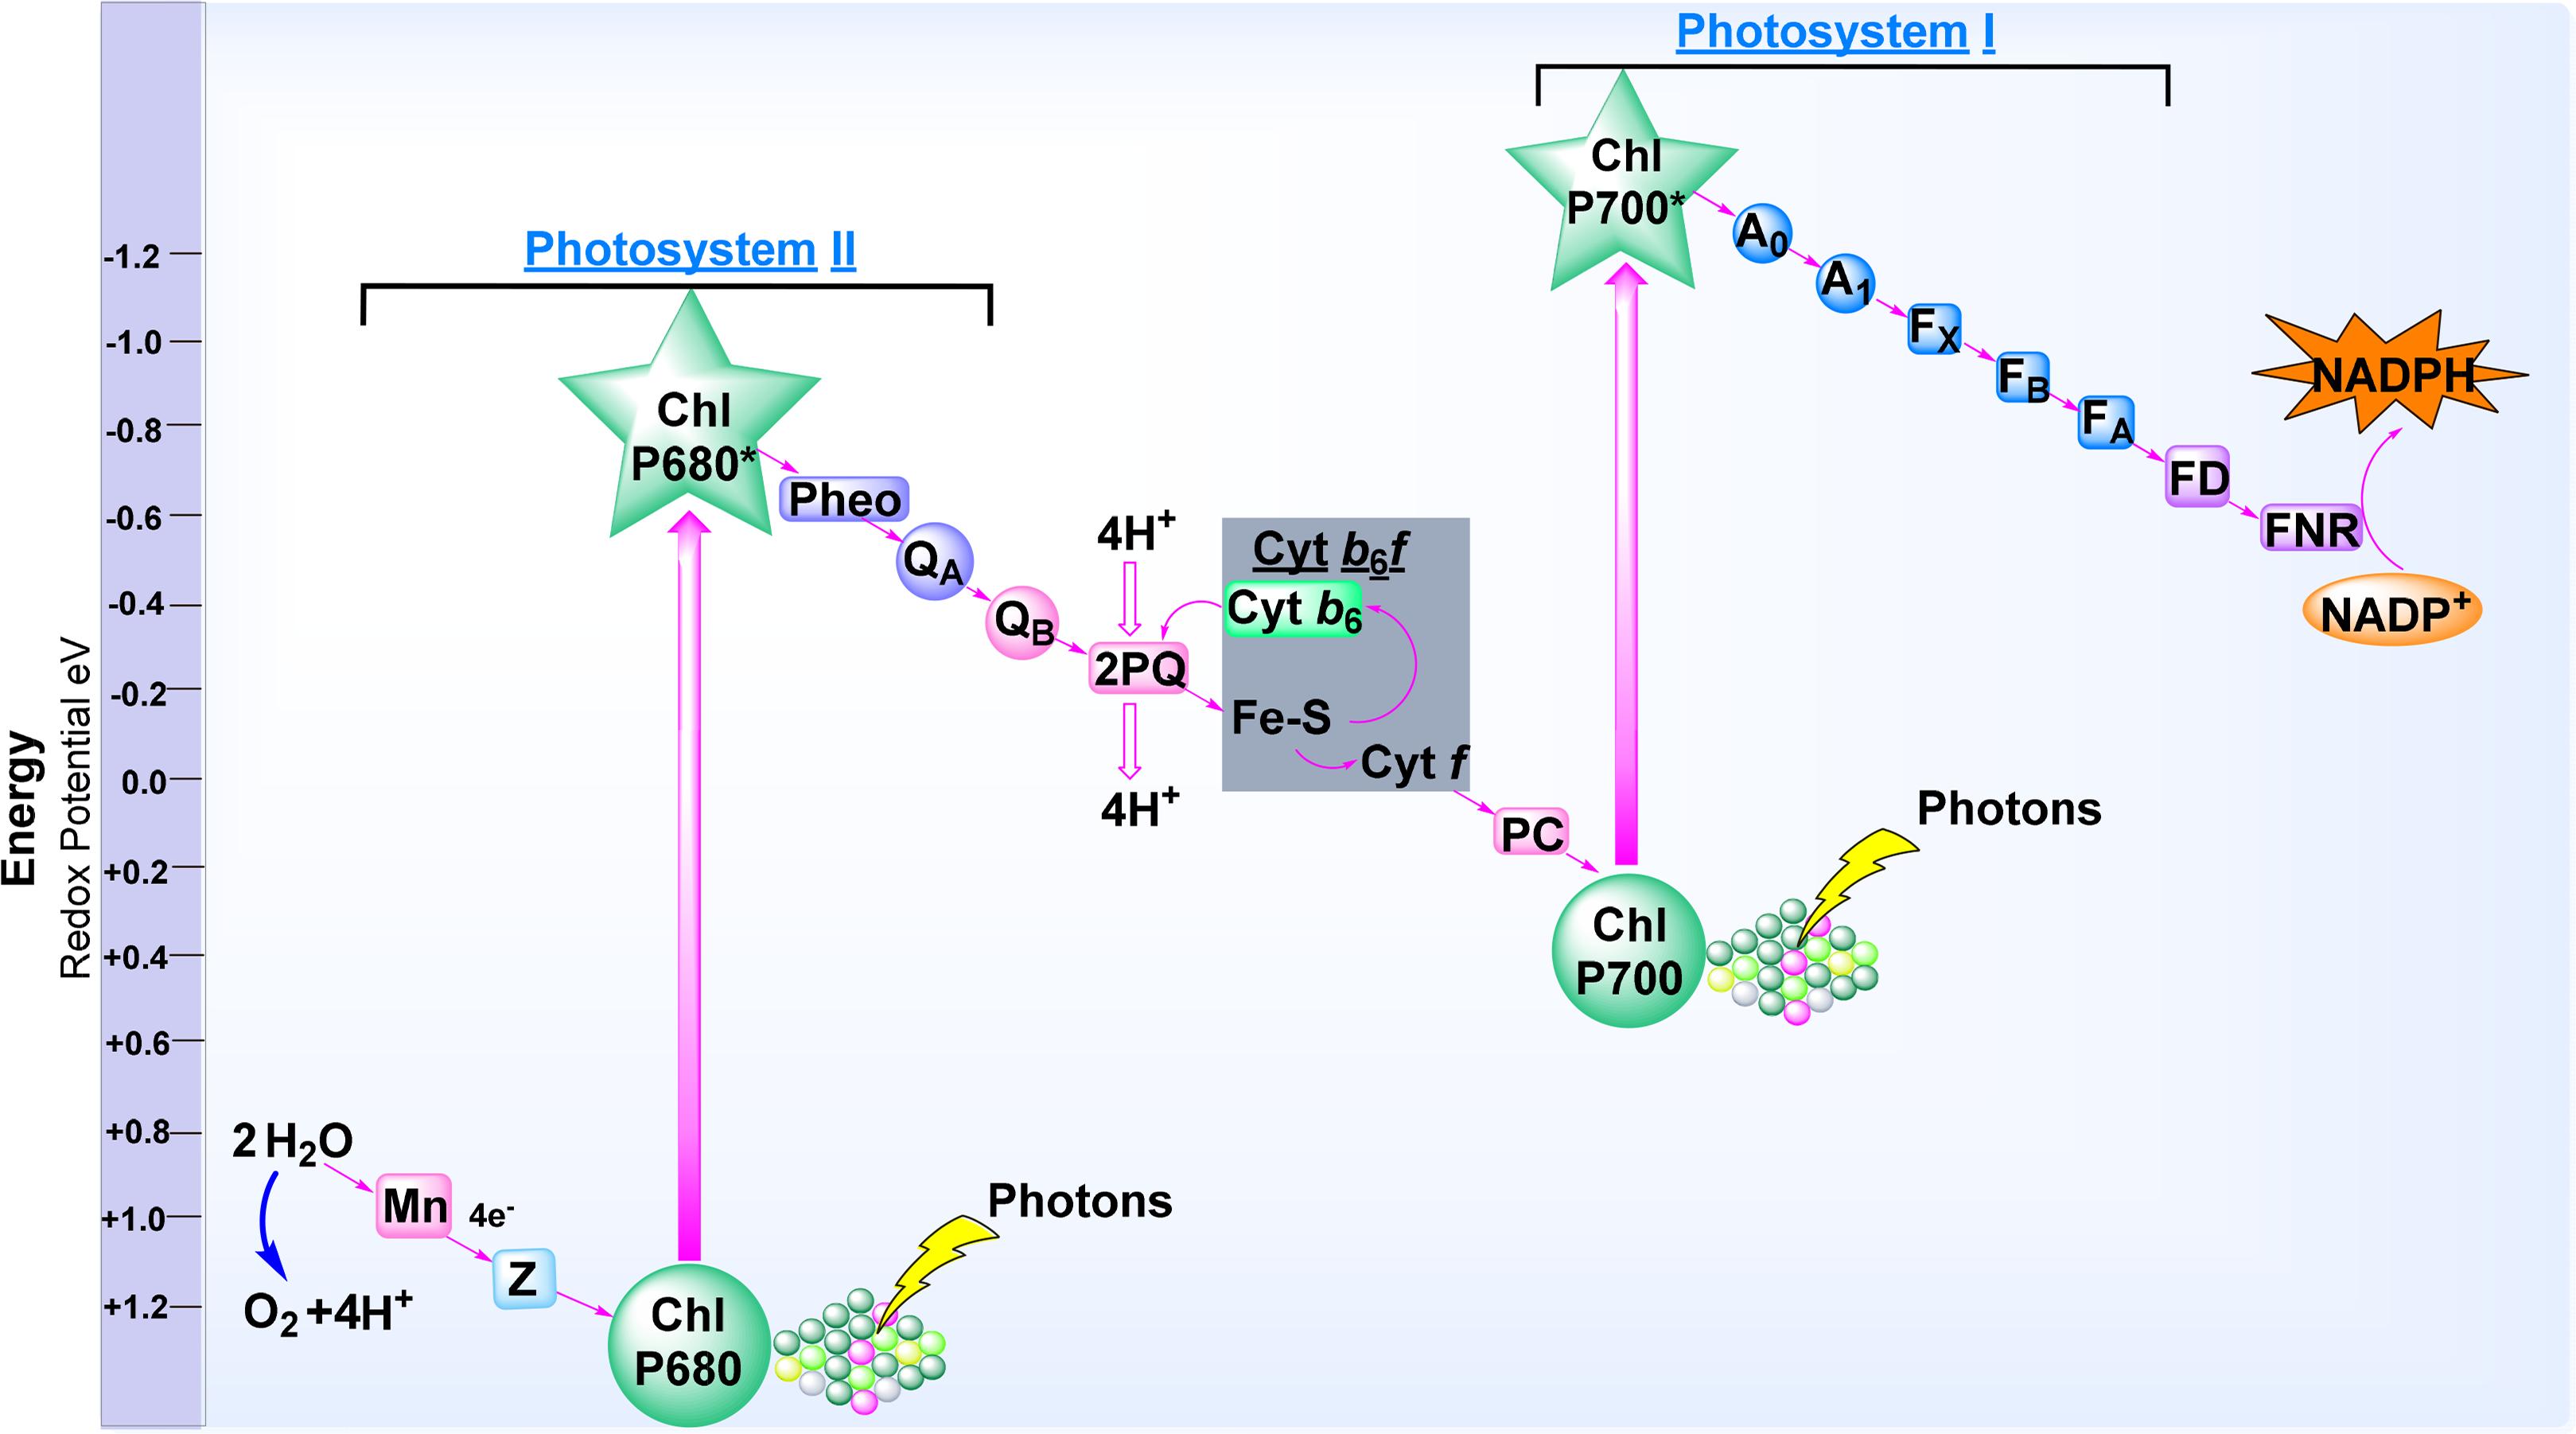 Oxygenic photosynthesis